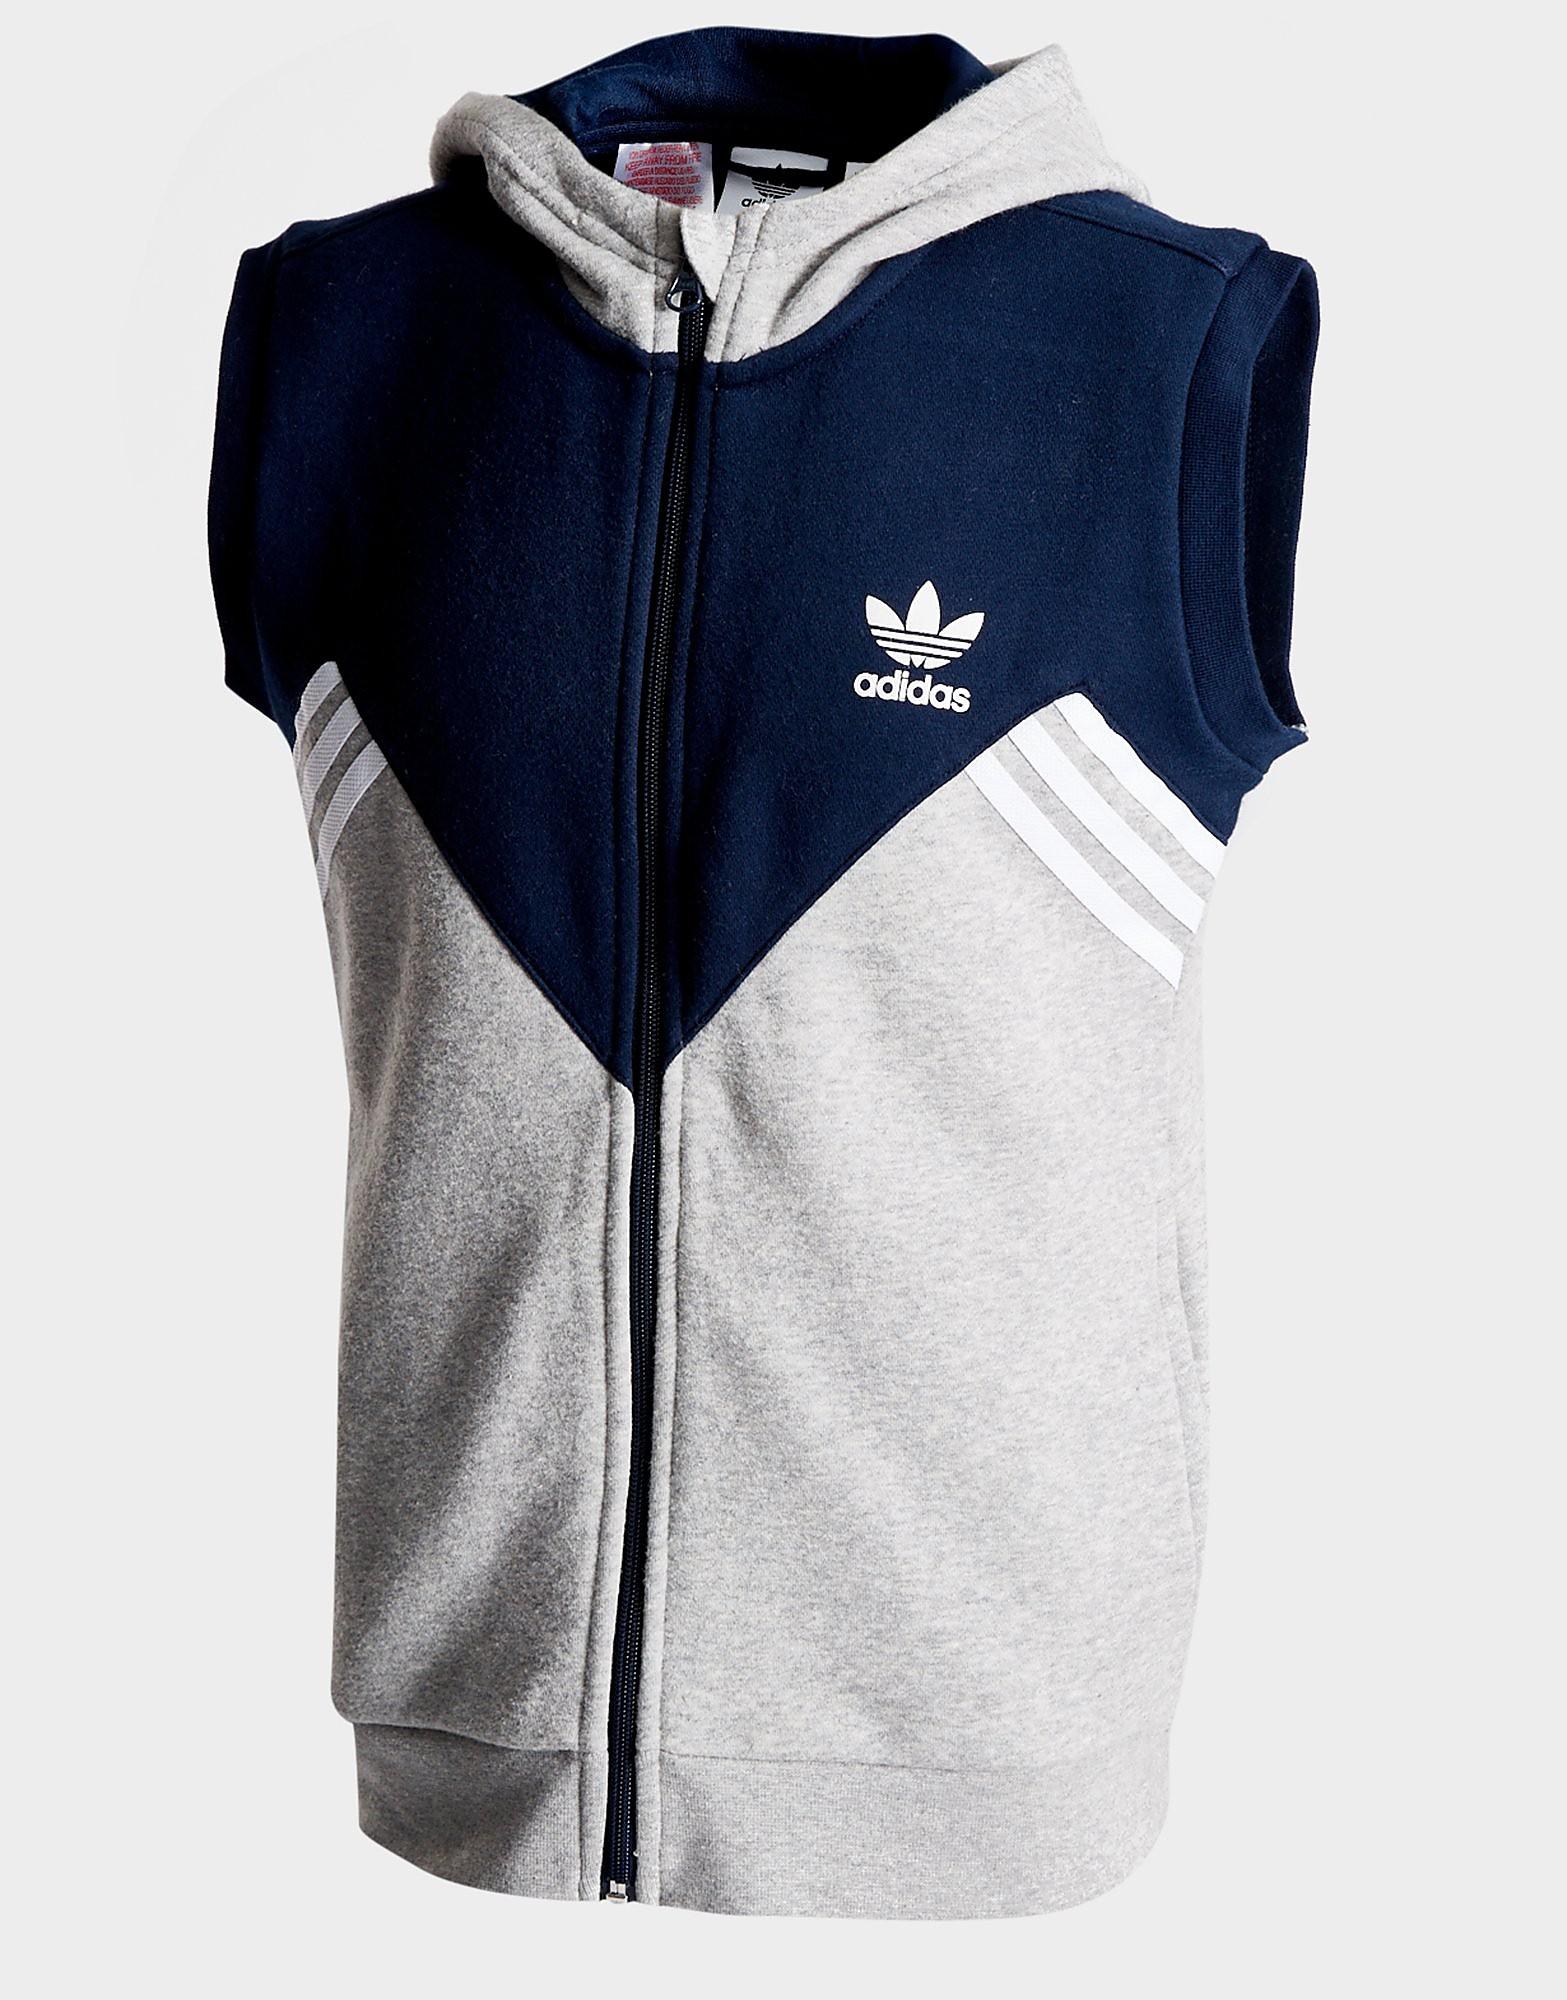 adidas Originals Moa Sleeveless Full Zip Hoodie Junior